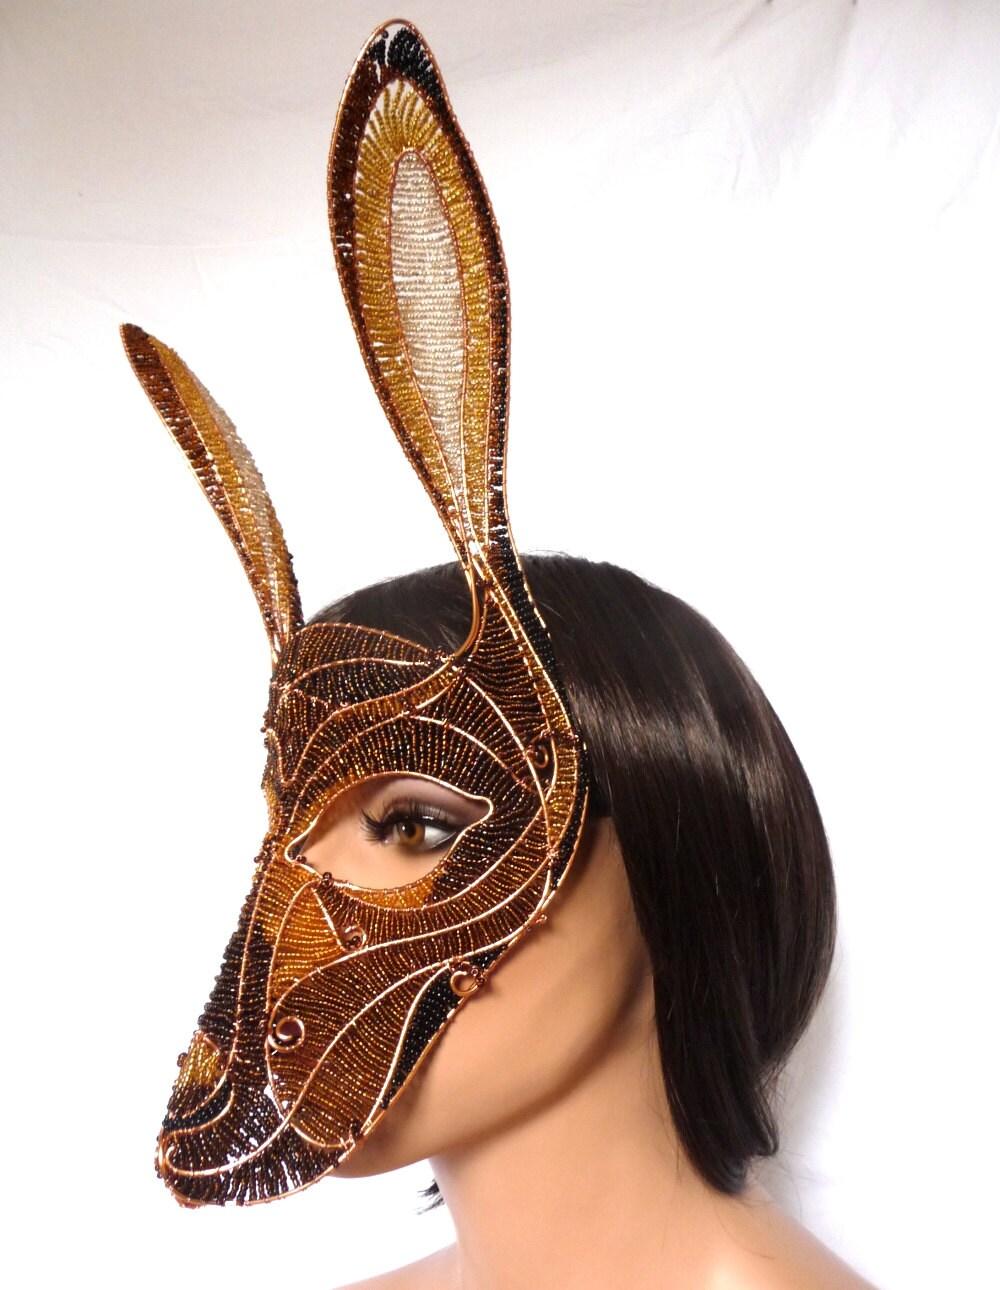 Hare masquerade mask, womens, costume, accessories